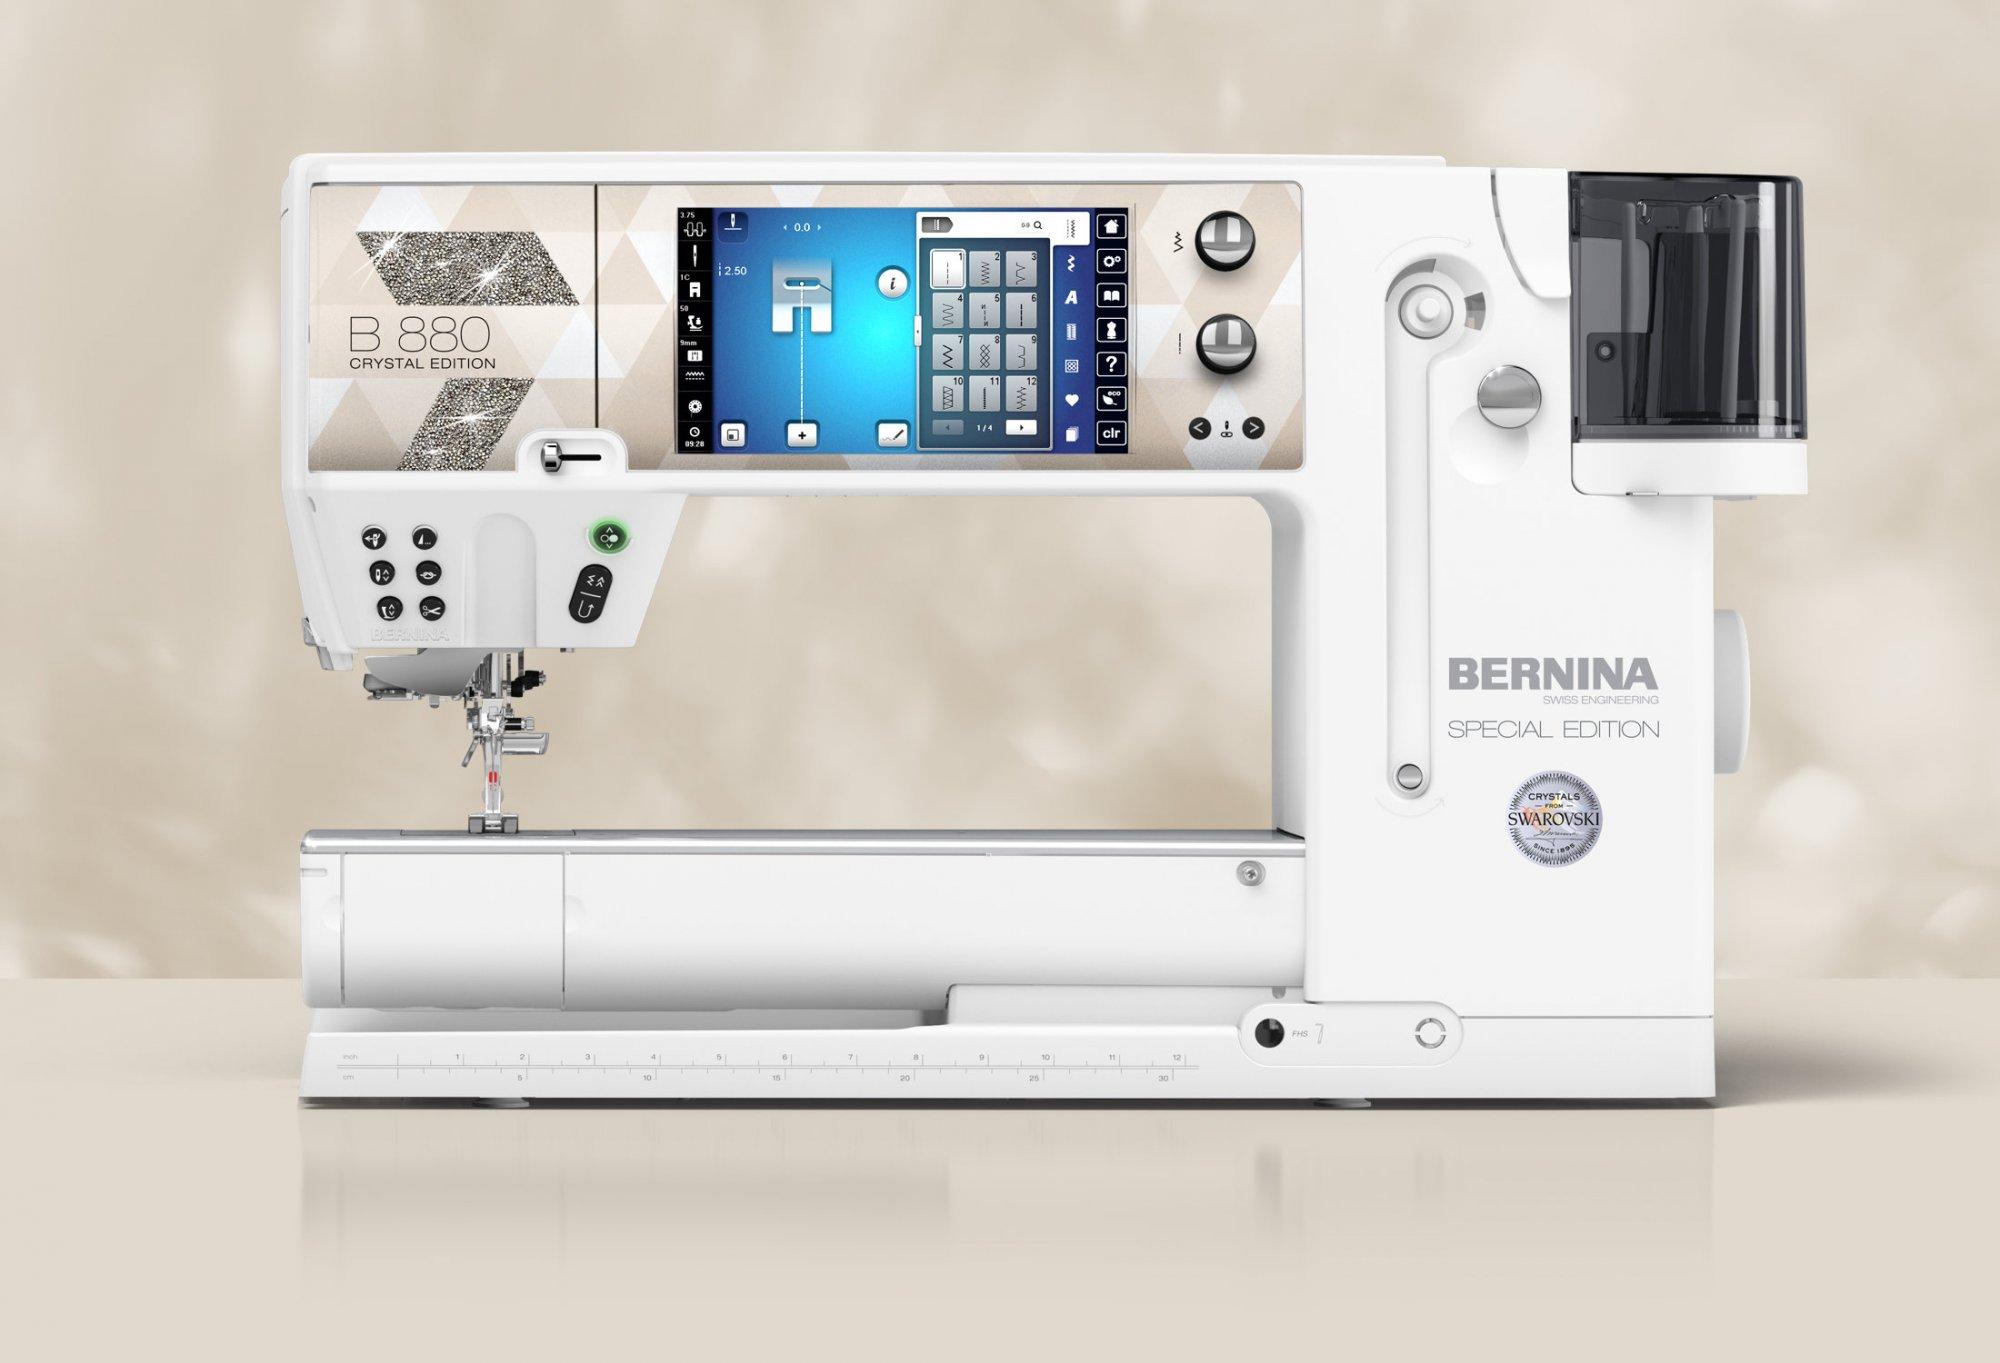 Bernina 880 Plus Crystal Edition